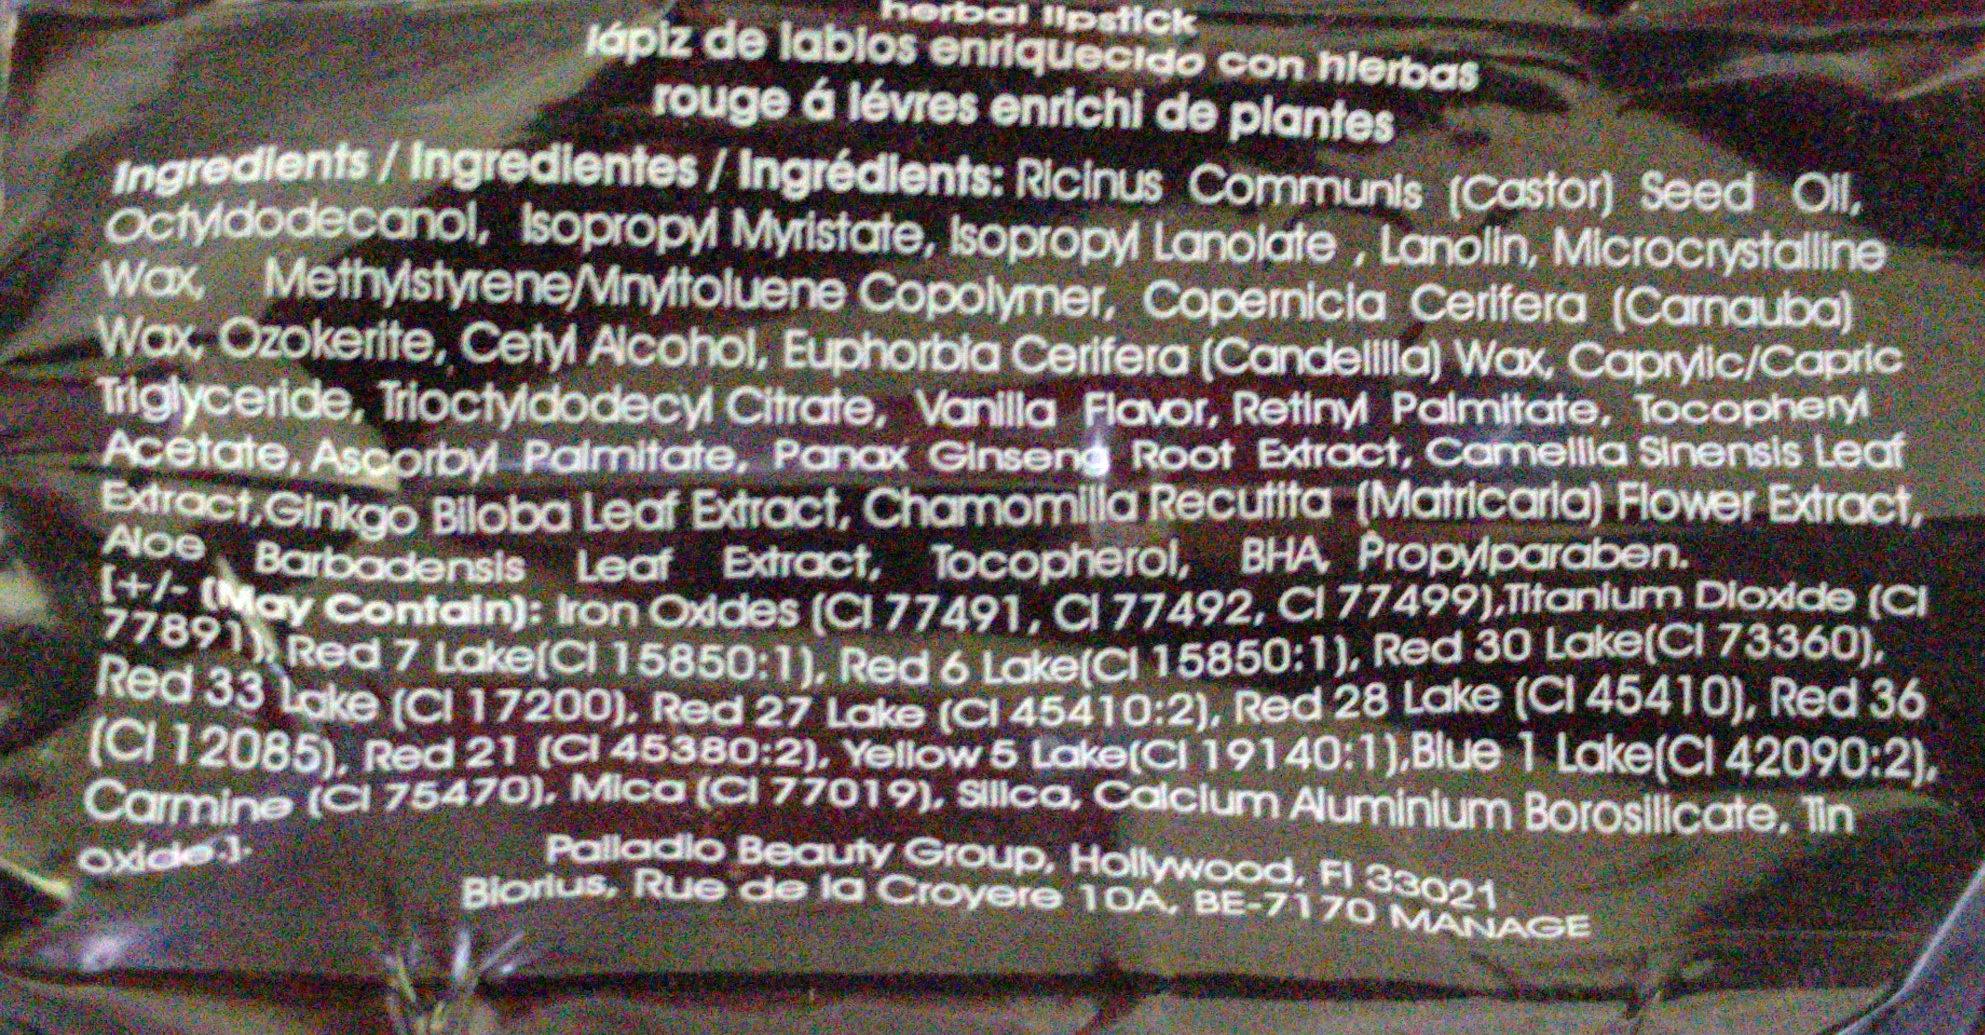 Herbal Lipstick Pinky - Ingredients